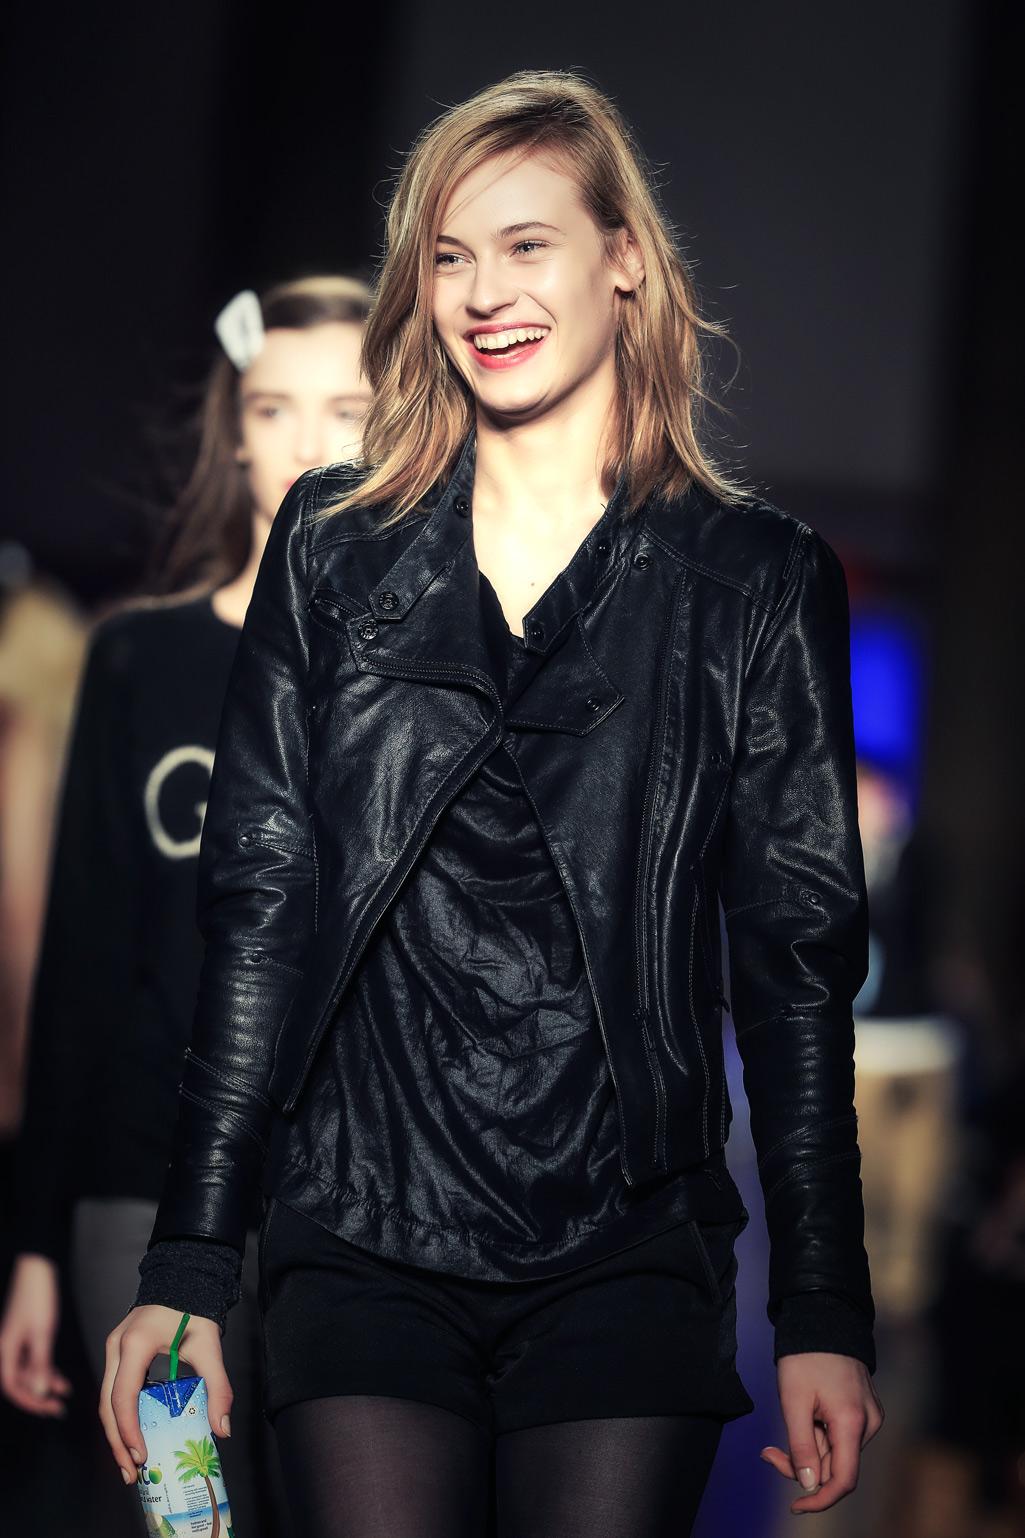 london-fashionweek-backstage-355